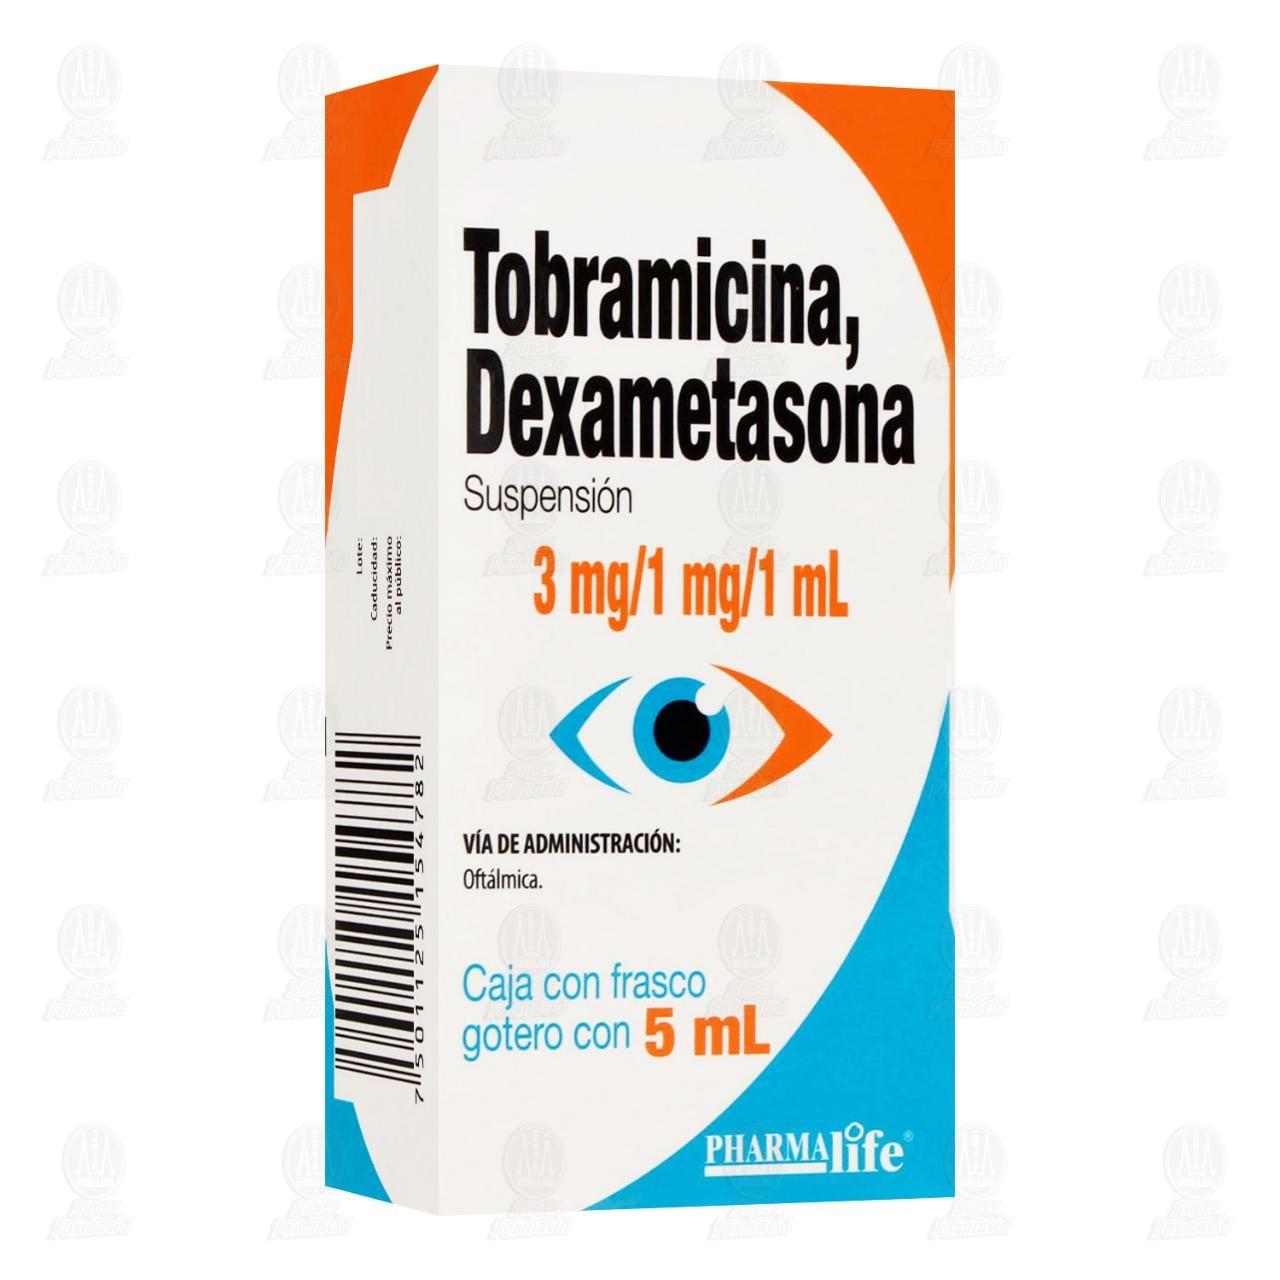 Comprar Tobramicina/Dexametasona 3mg/1mg/1ml 5ml Suspensión Oftálmica Pharmalife en Farmacias Guadalajara